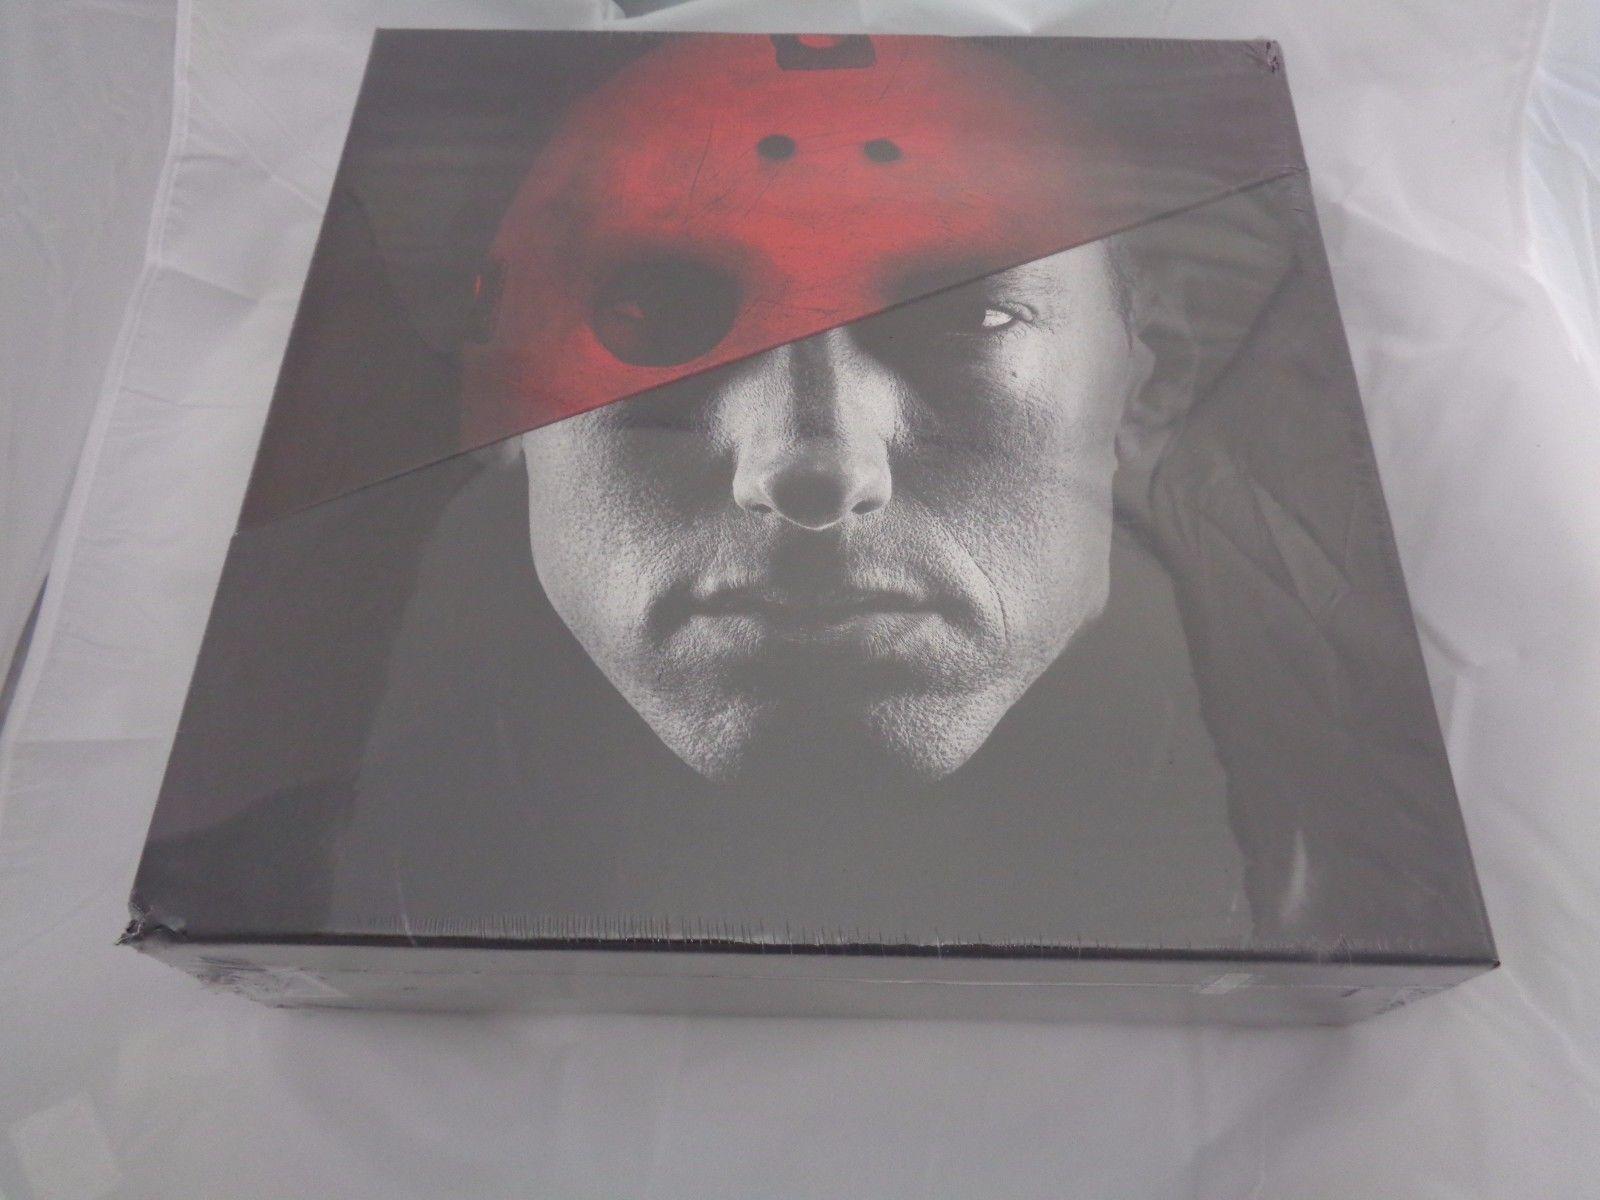 Brand New Eminem The Vinyl Lp Record Limited Edition 10 Lp